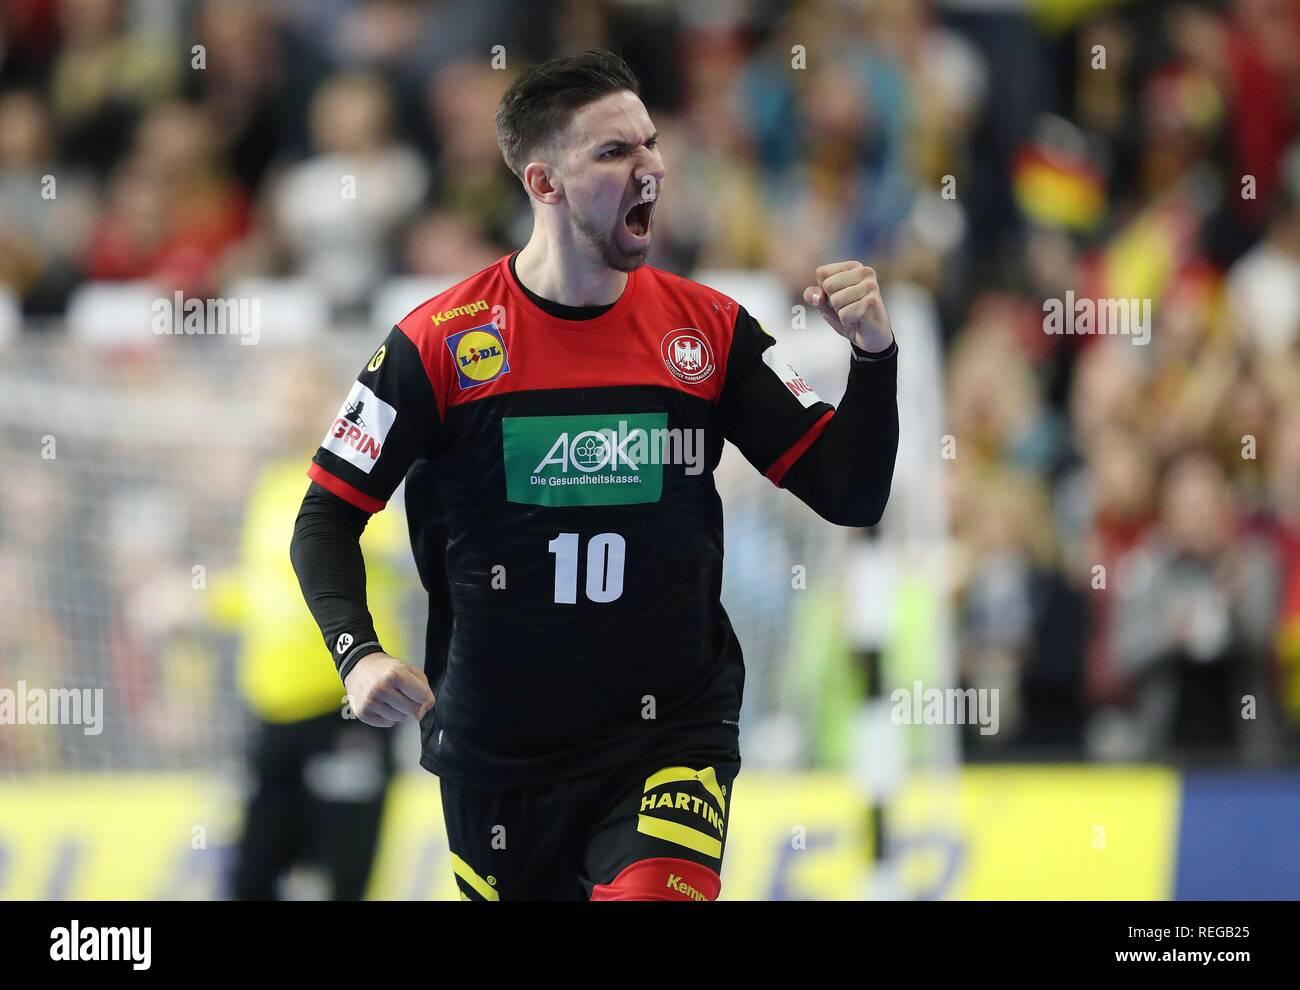 firo: 21.01.2019, Handball: World Cup World Cup Main Round Croatia Croatia - Germany 21:22 jubilation, Fabian Wiede, GER   usage worldwide - Stock Image